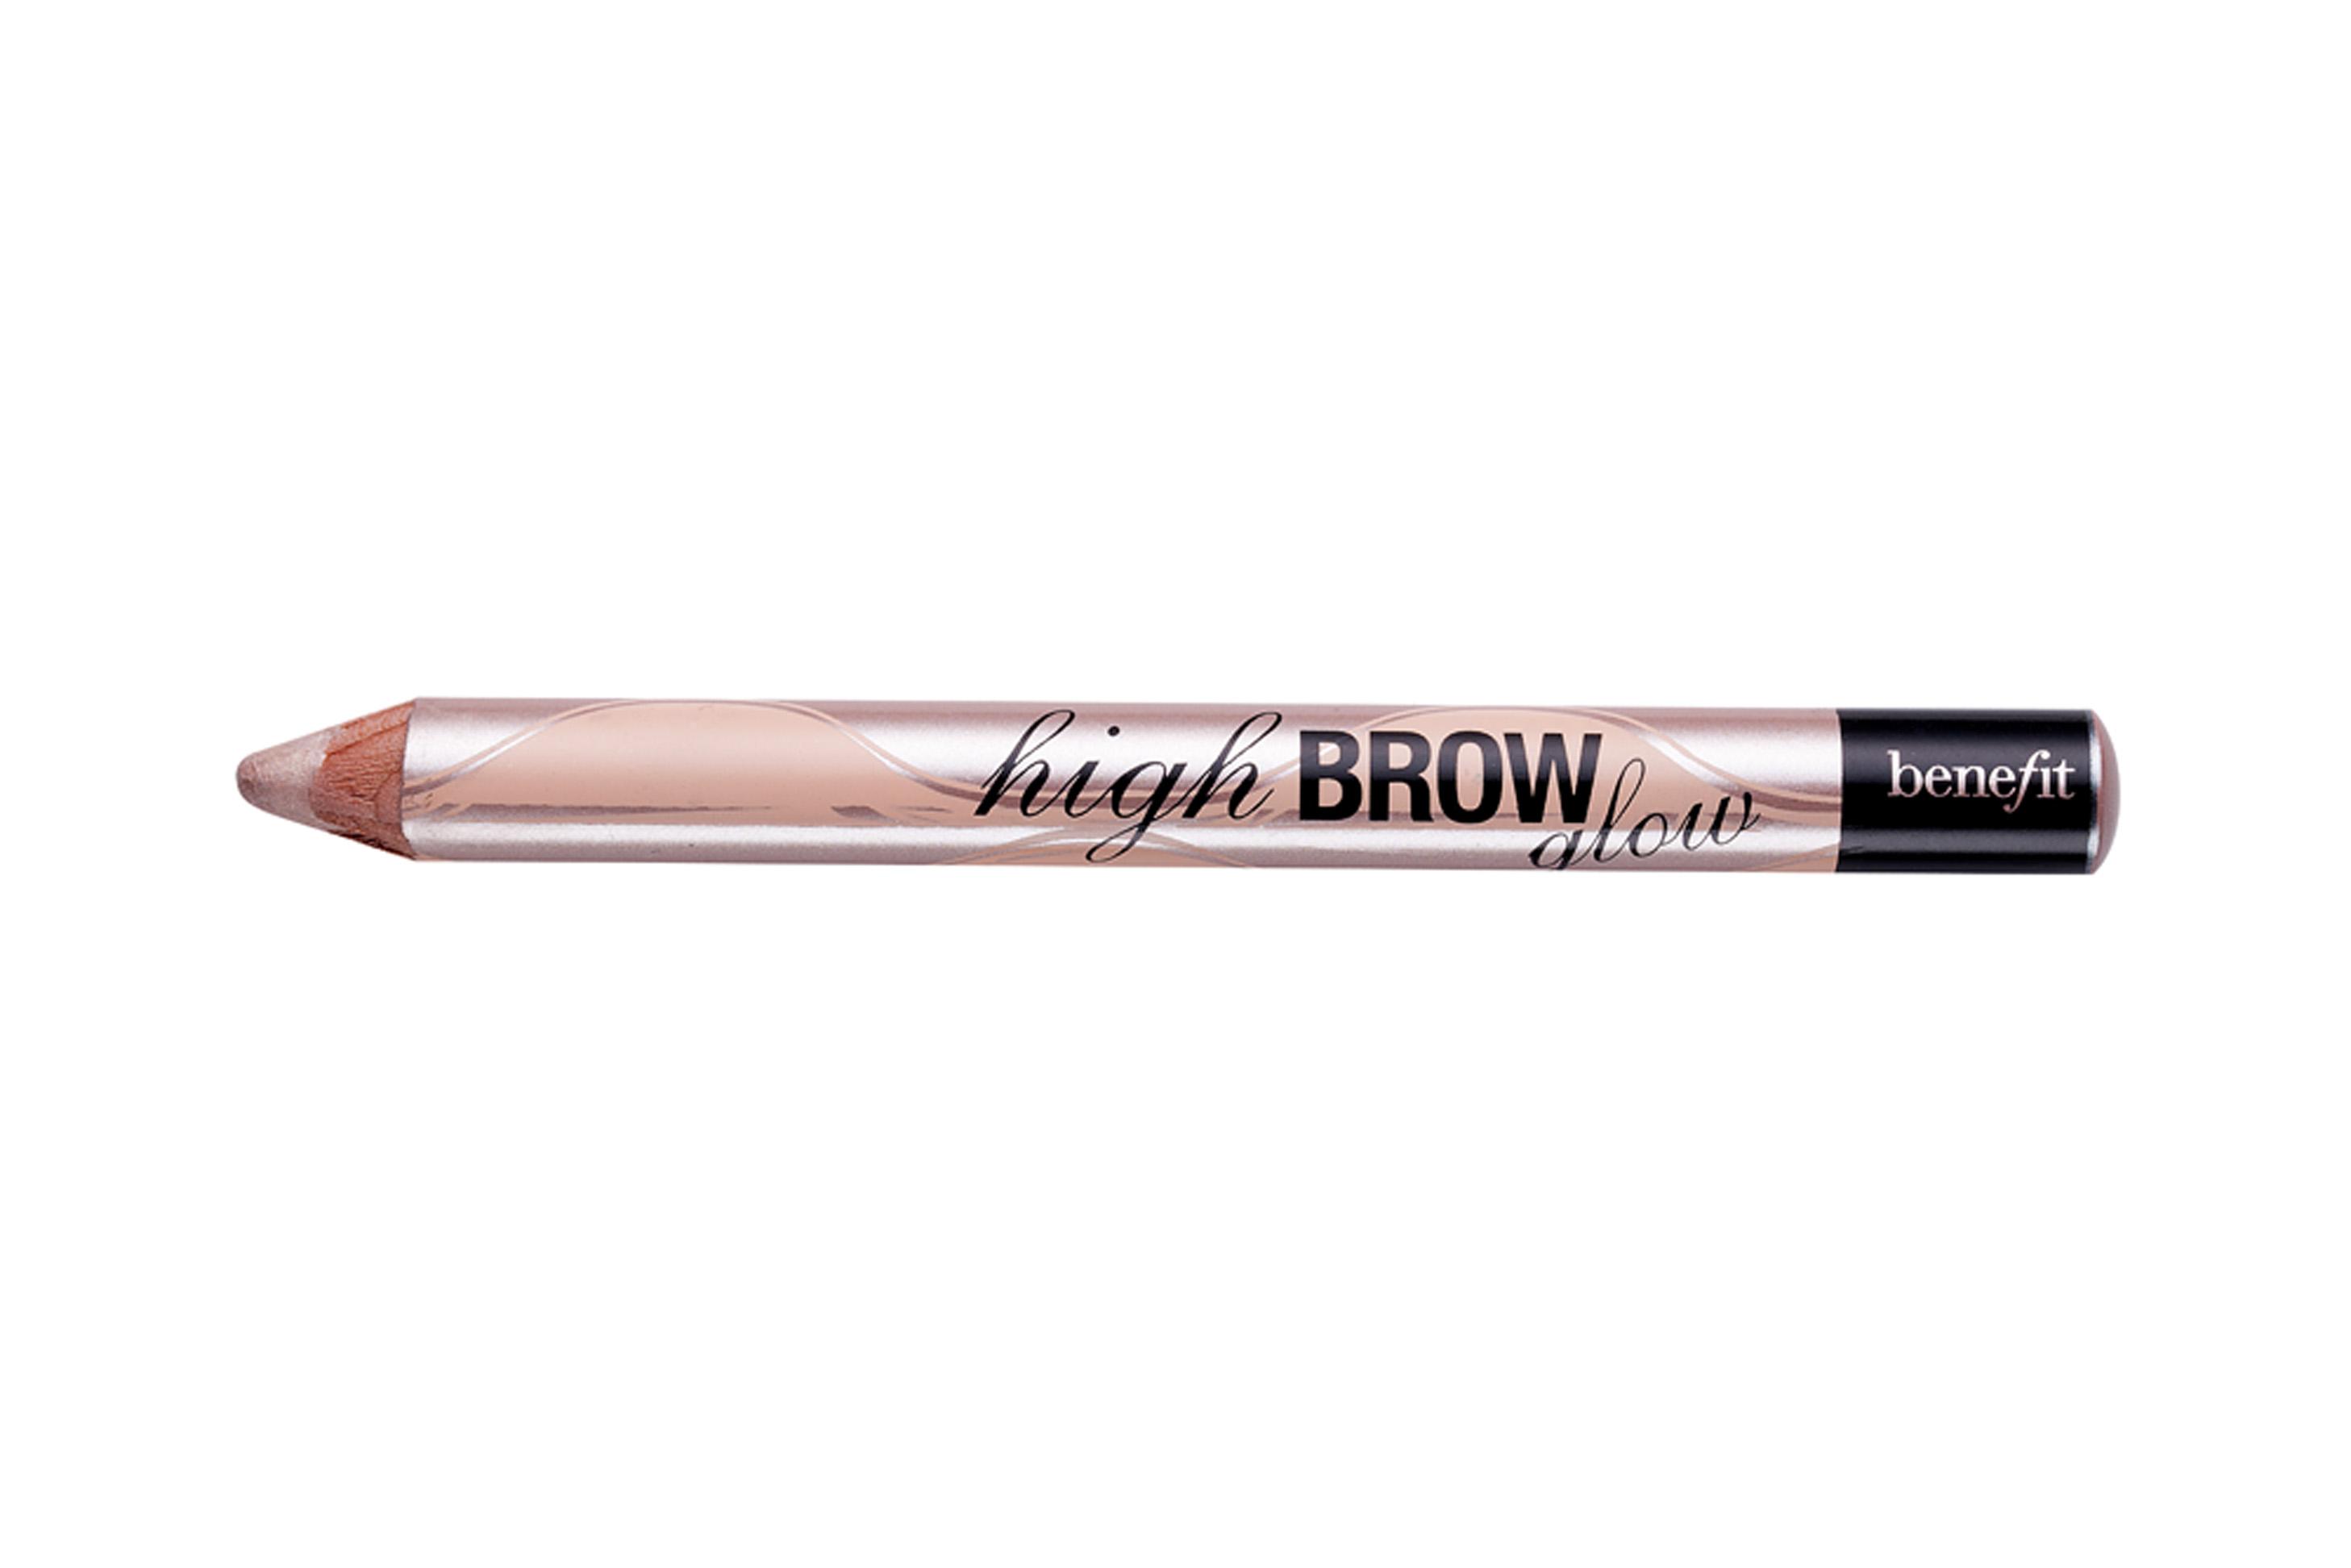 Lápis iluminador High Brown Glow Benefit R$ 99